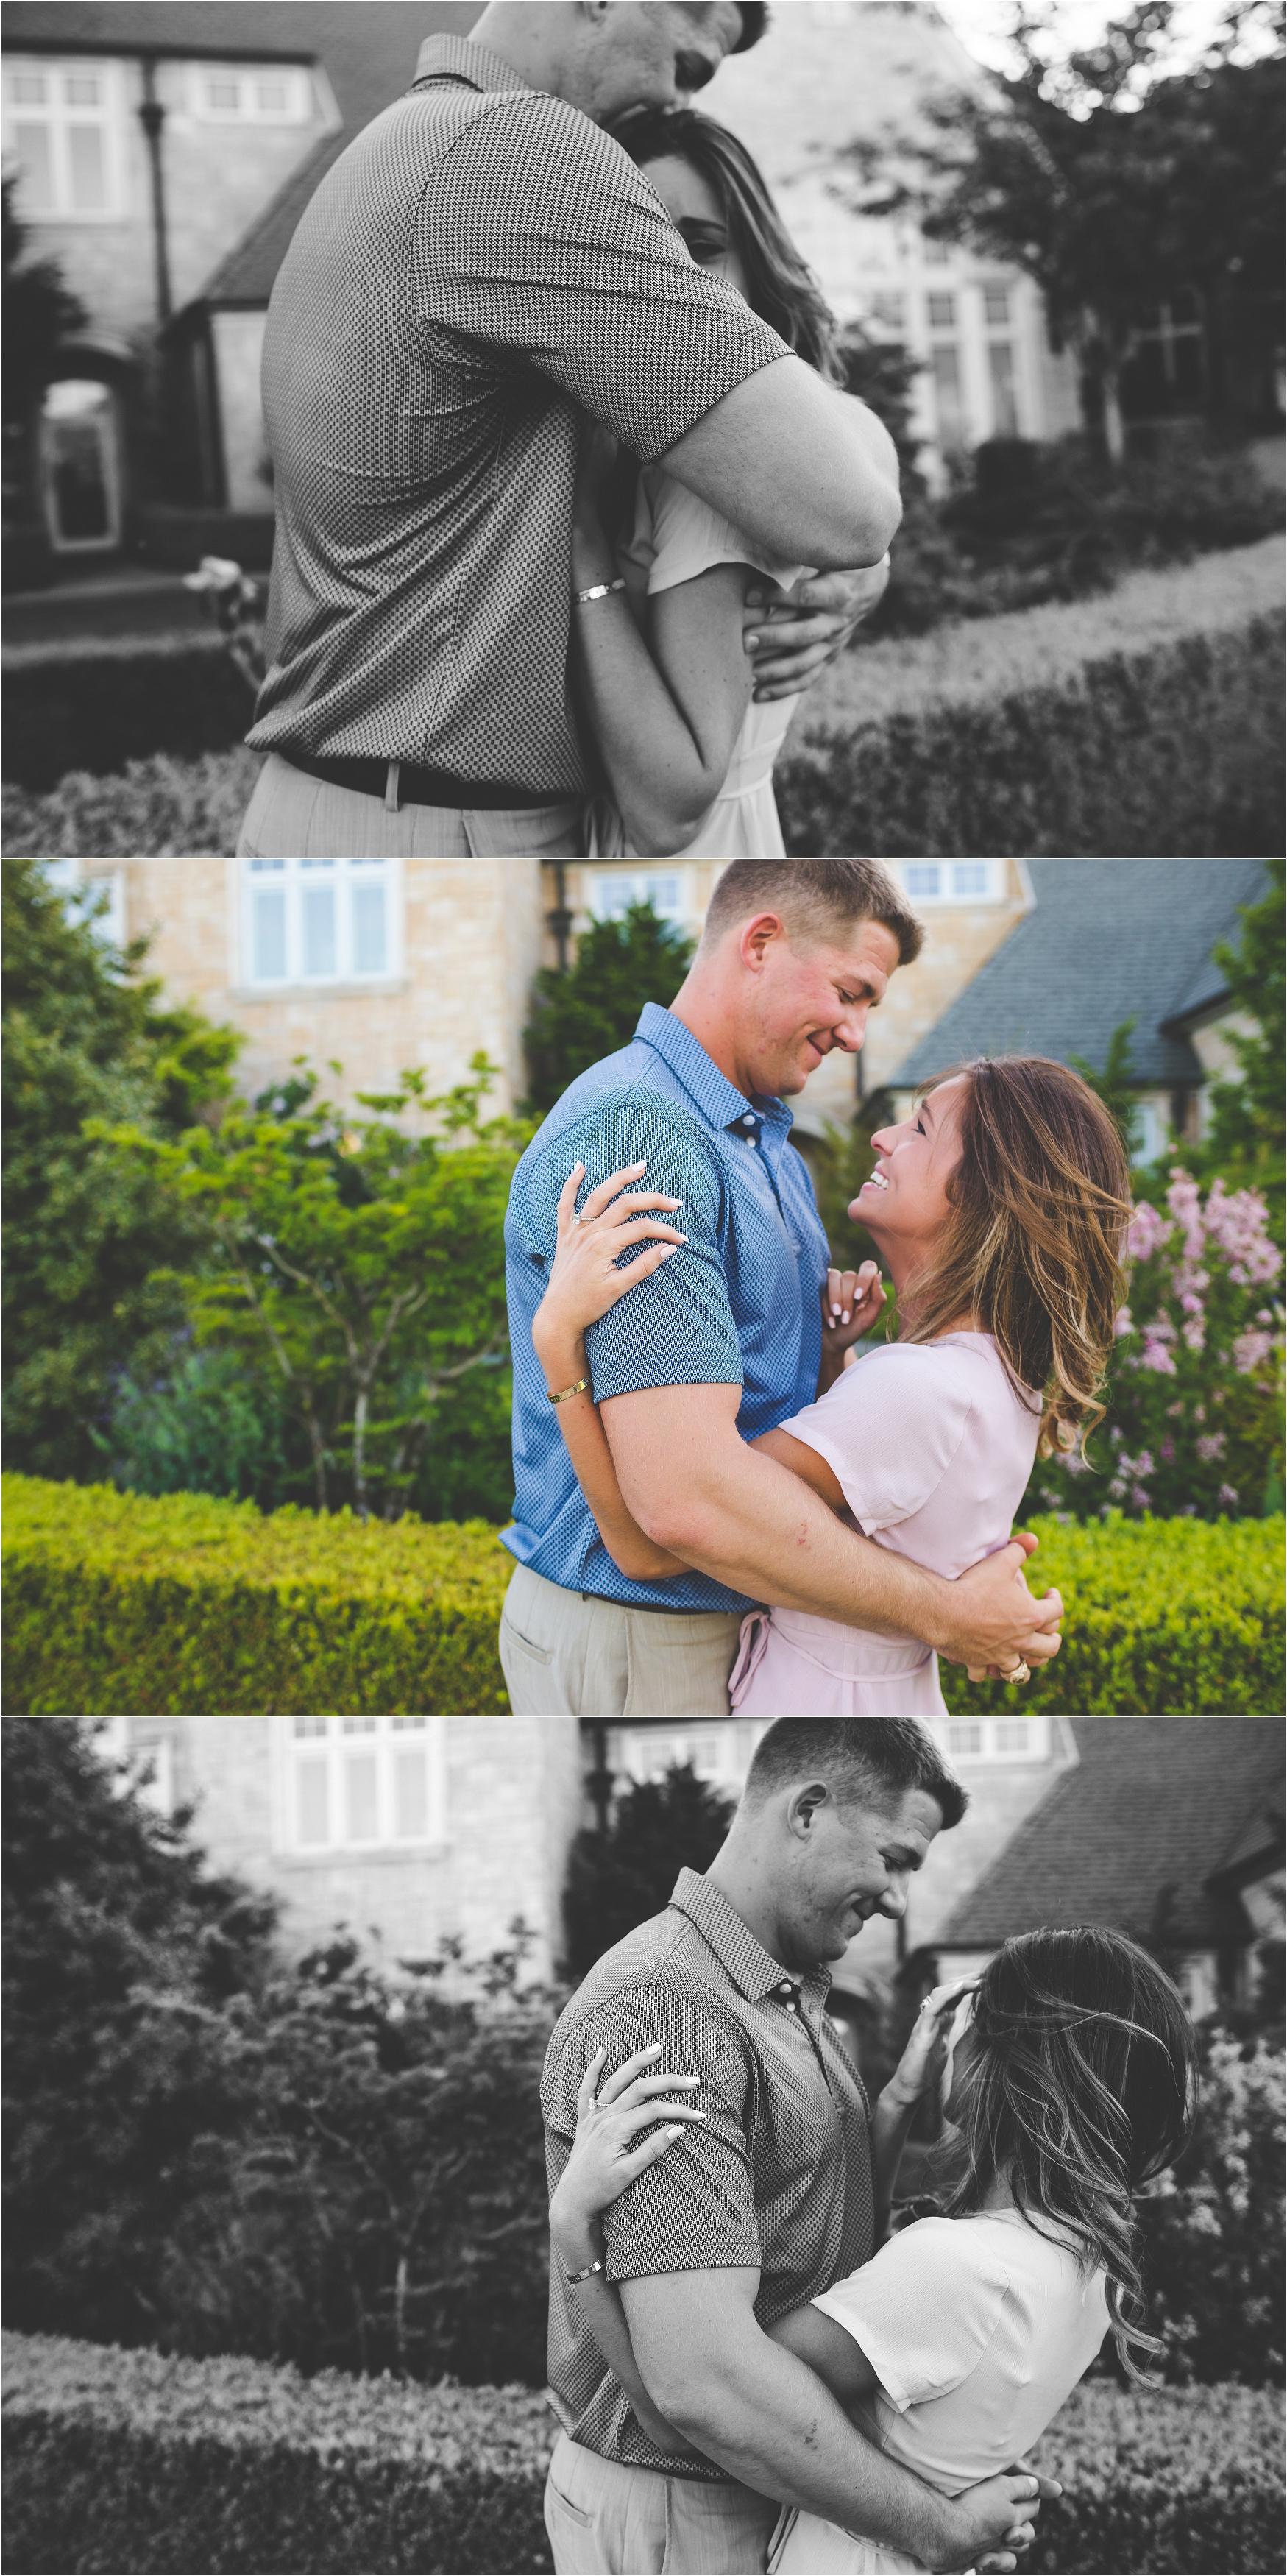 newcastle-golf-club-proposal-jannicka-mayte-seattle-washington-engagement-wedding-photographer_0046.jpg